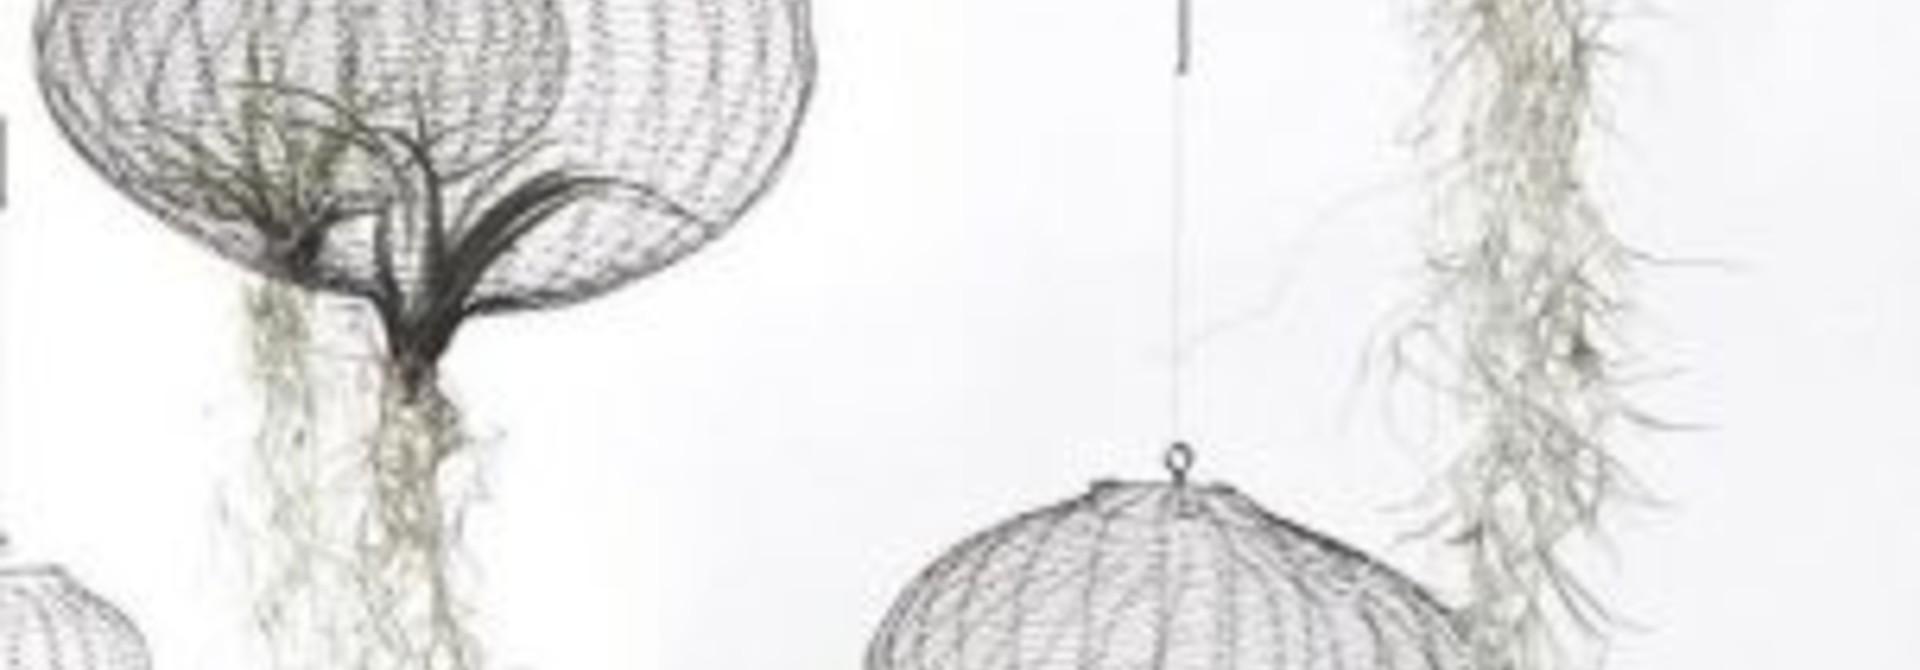 3 x WIRED: TOP DESIGN VAN METAALDRAAD EN KIPPENGAAS